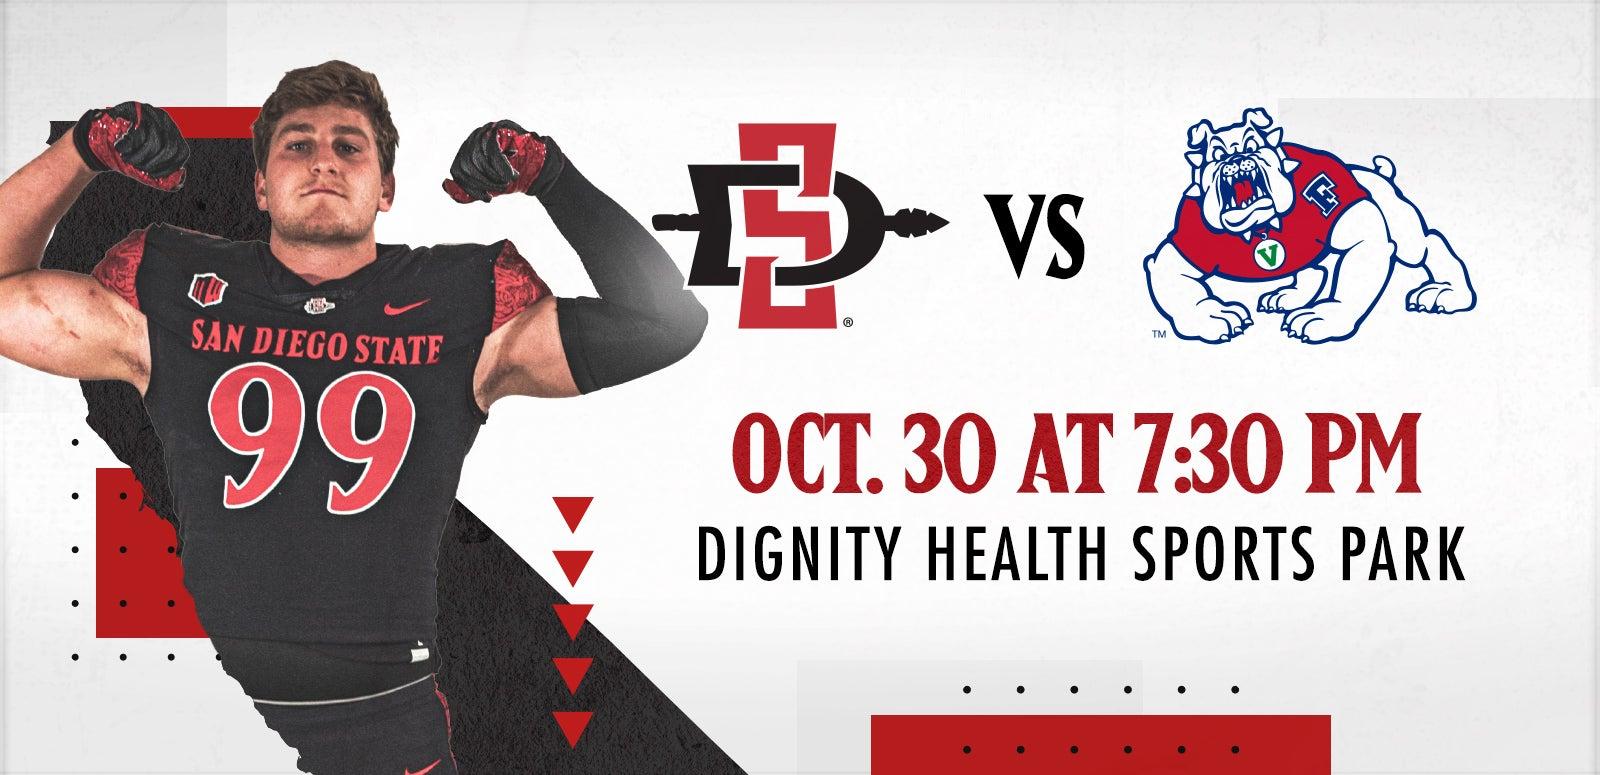 San Diego State vs Fresno State